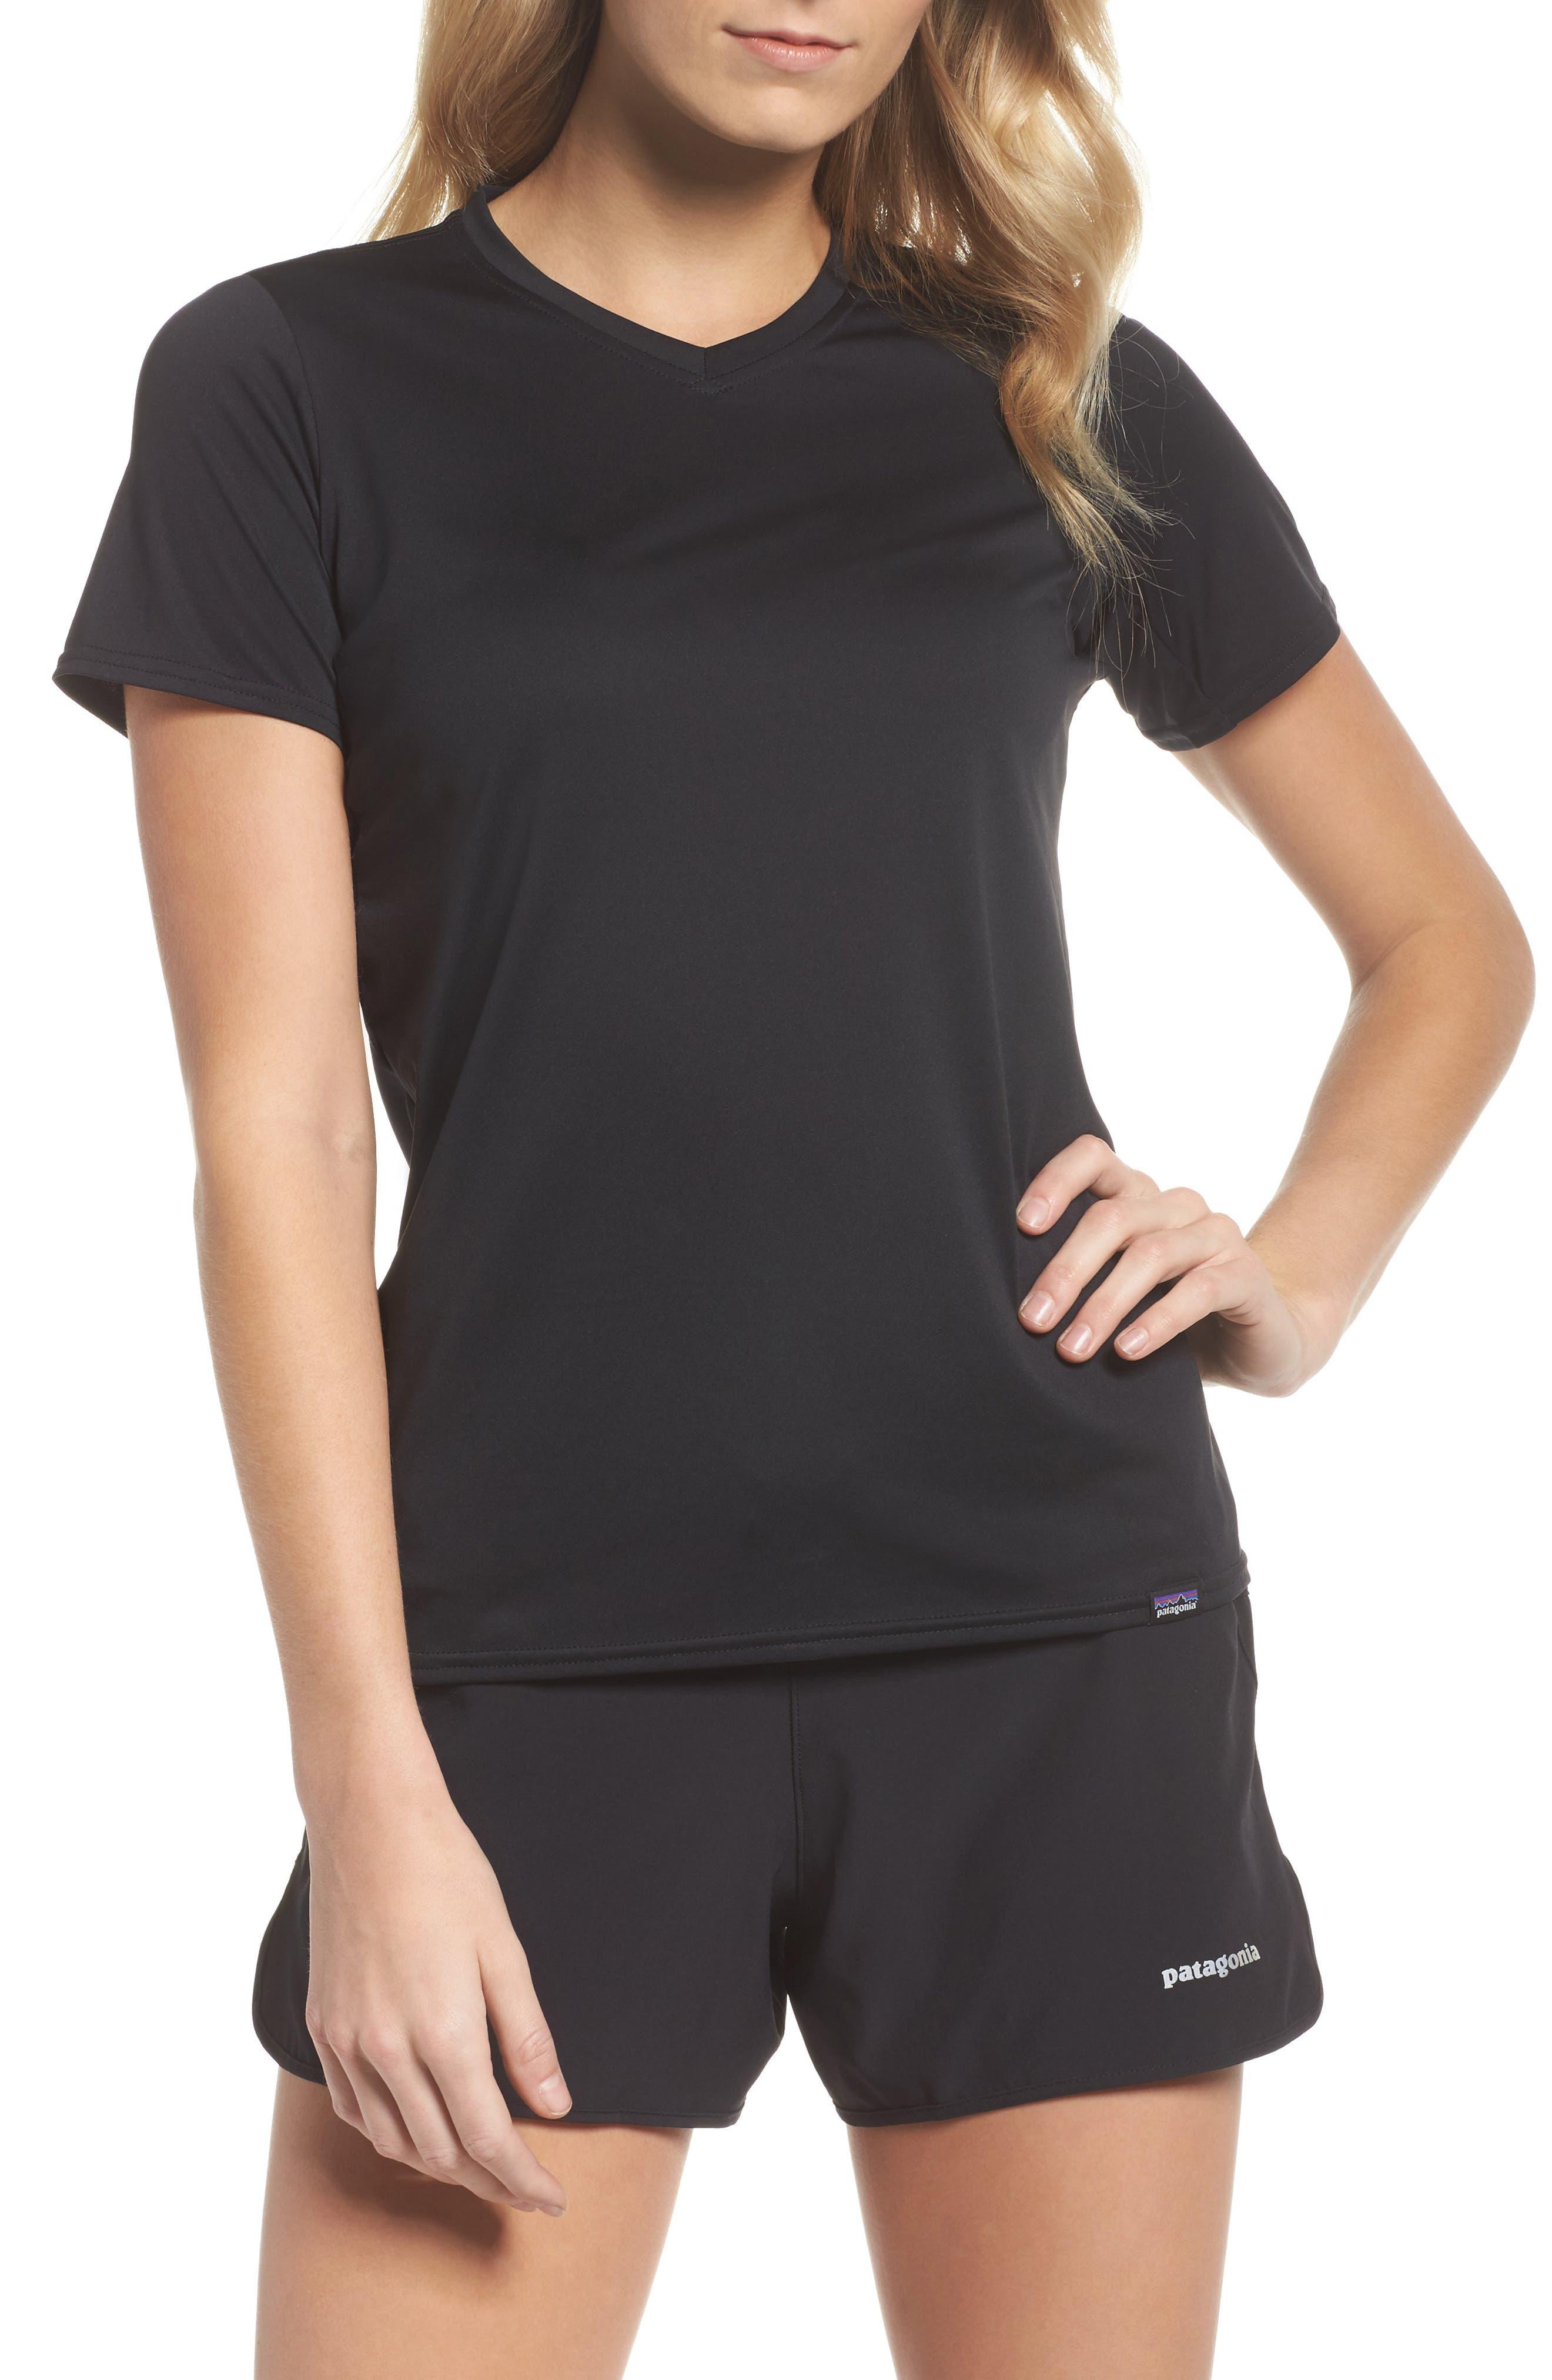 Capilene<sup>®</sup> Dailty T-Shirt,                             Main thumbnail 1, color,                             001